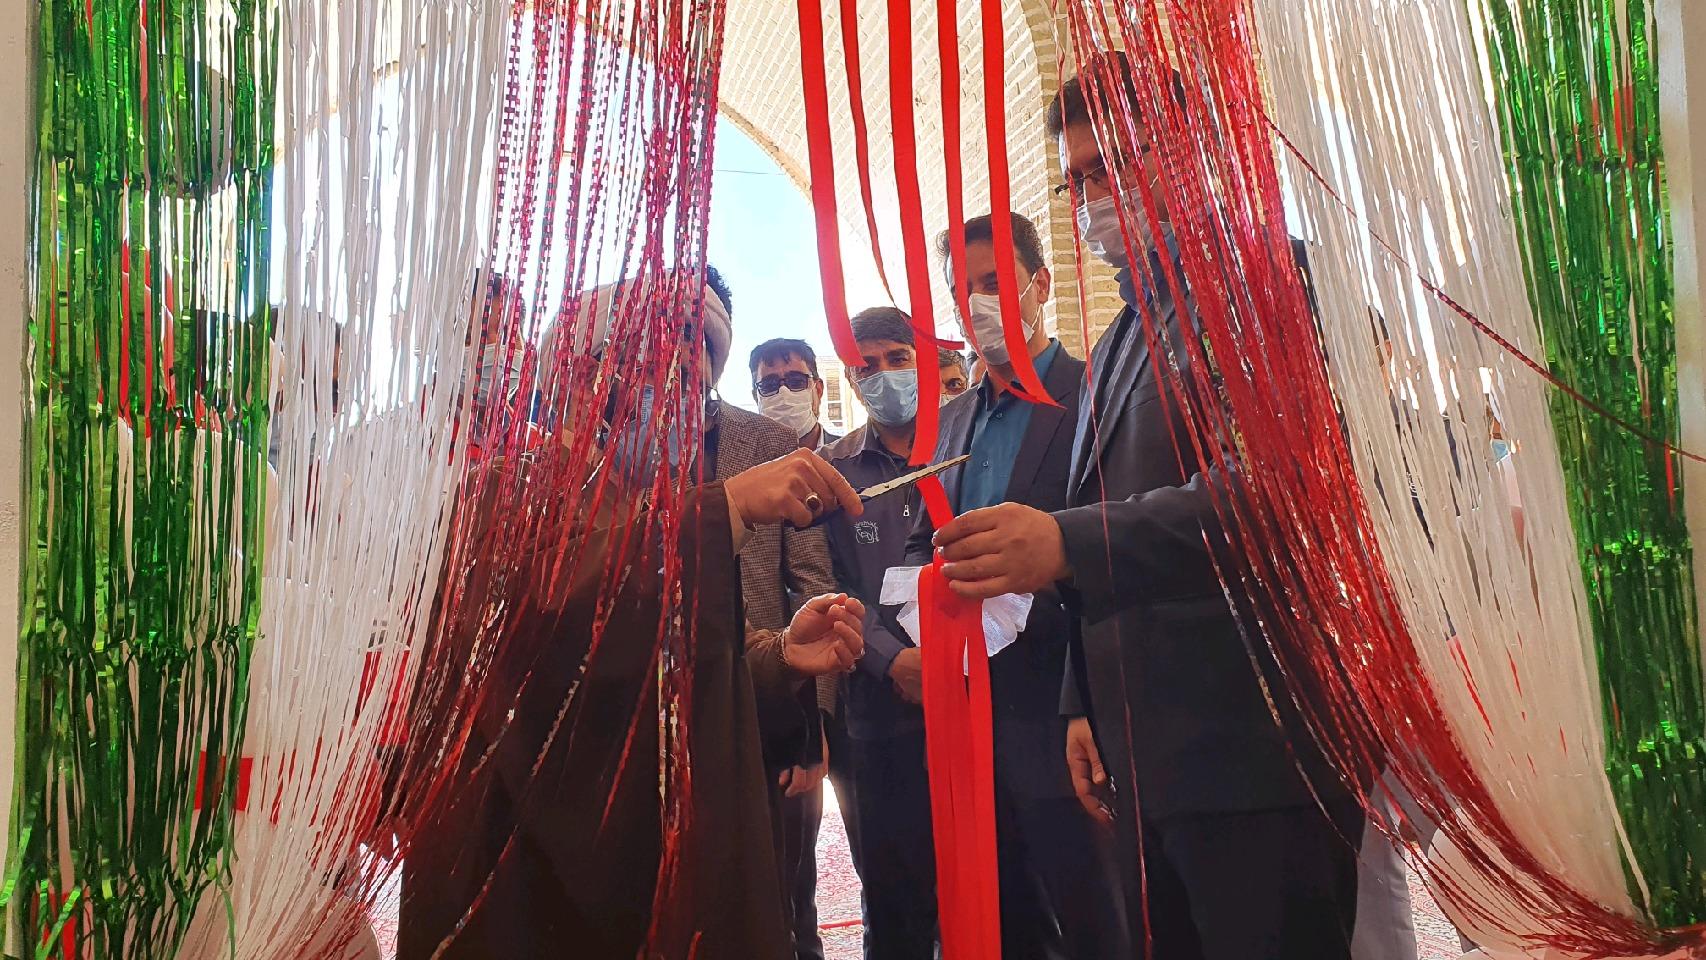 افتتاح پنجمین خانه هلال احمر در بافق